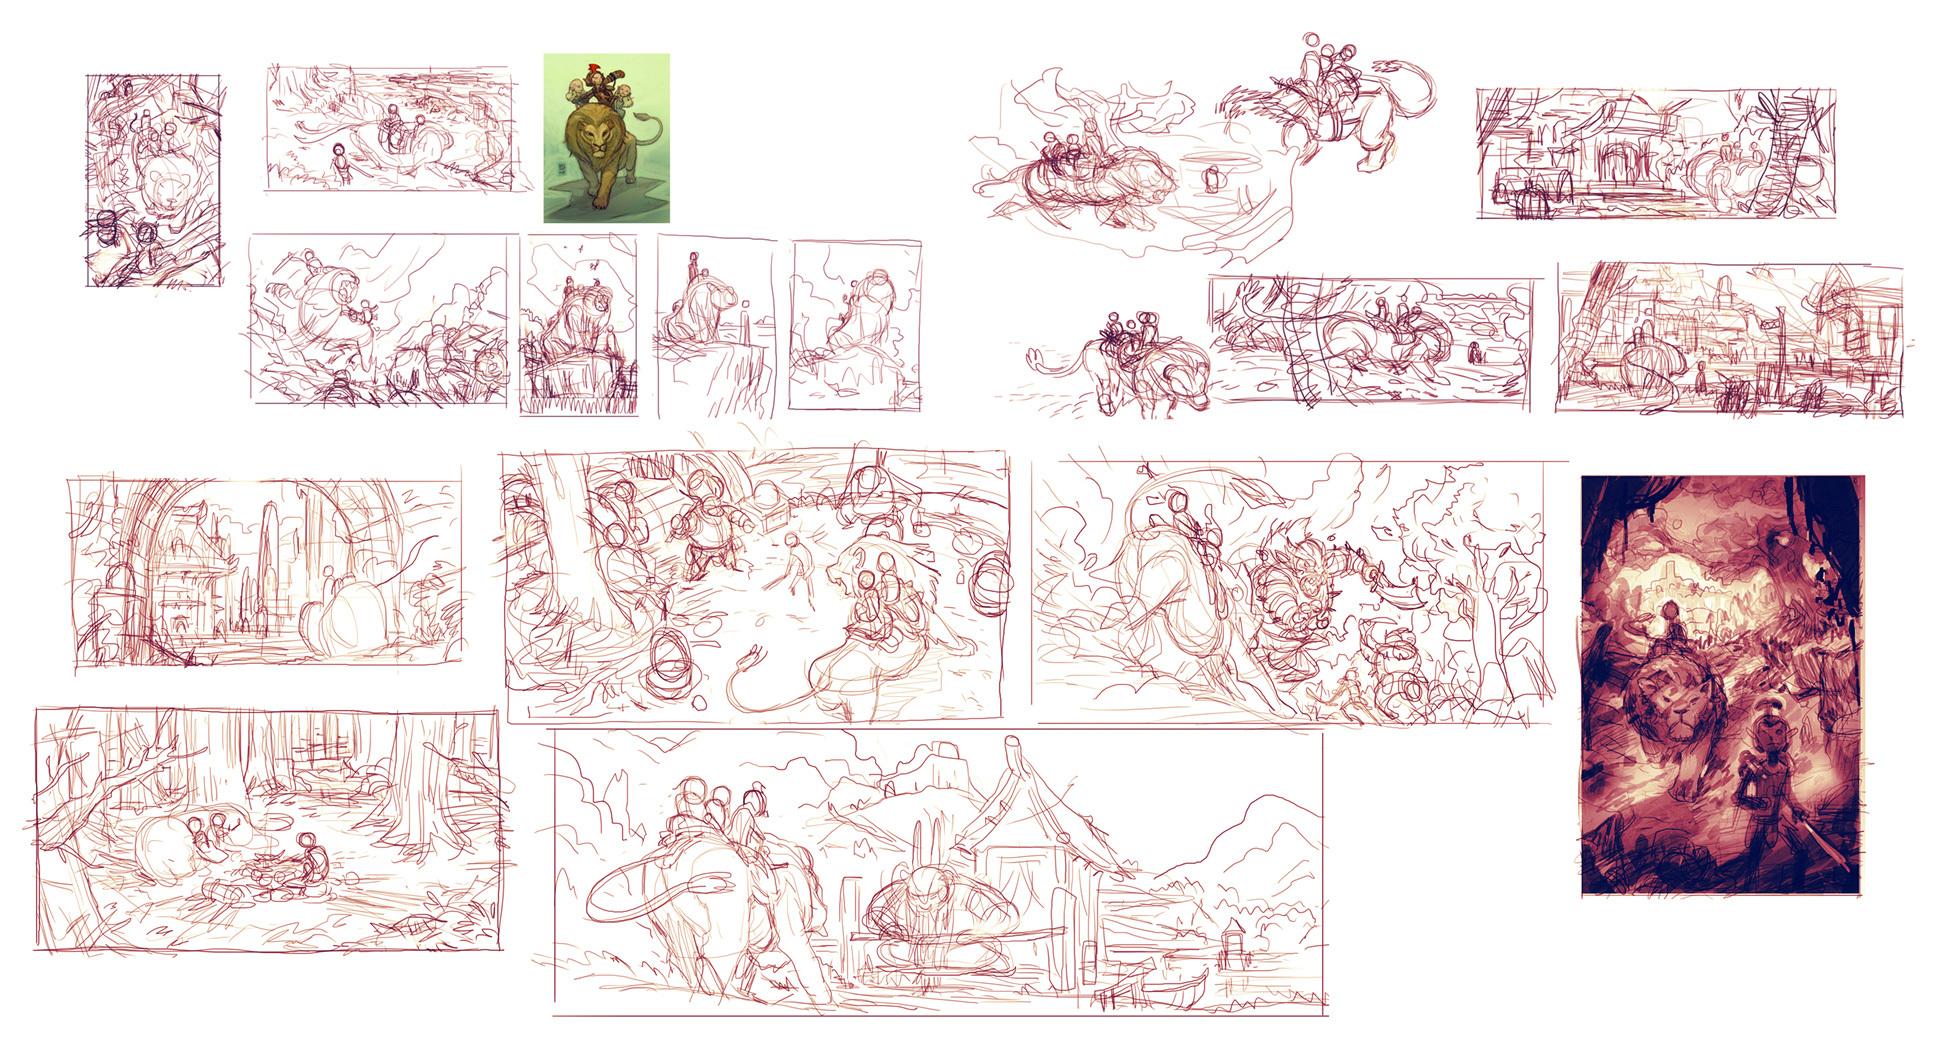 CGW-LionRiders-Thumbnails.jpg